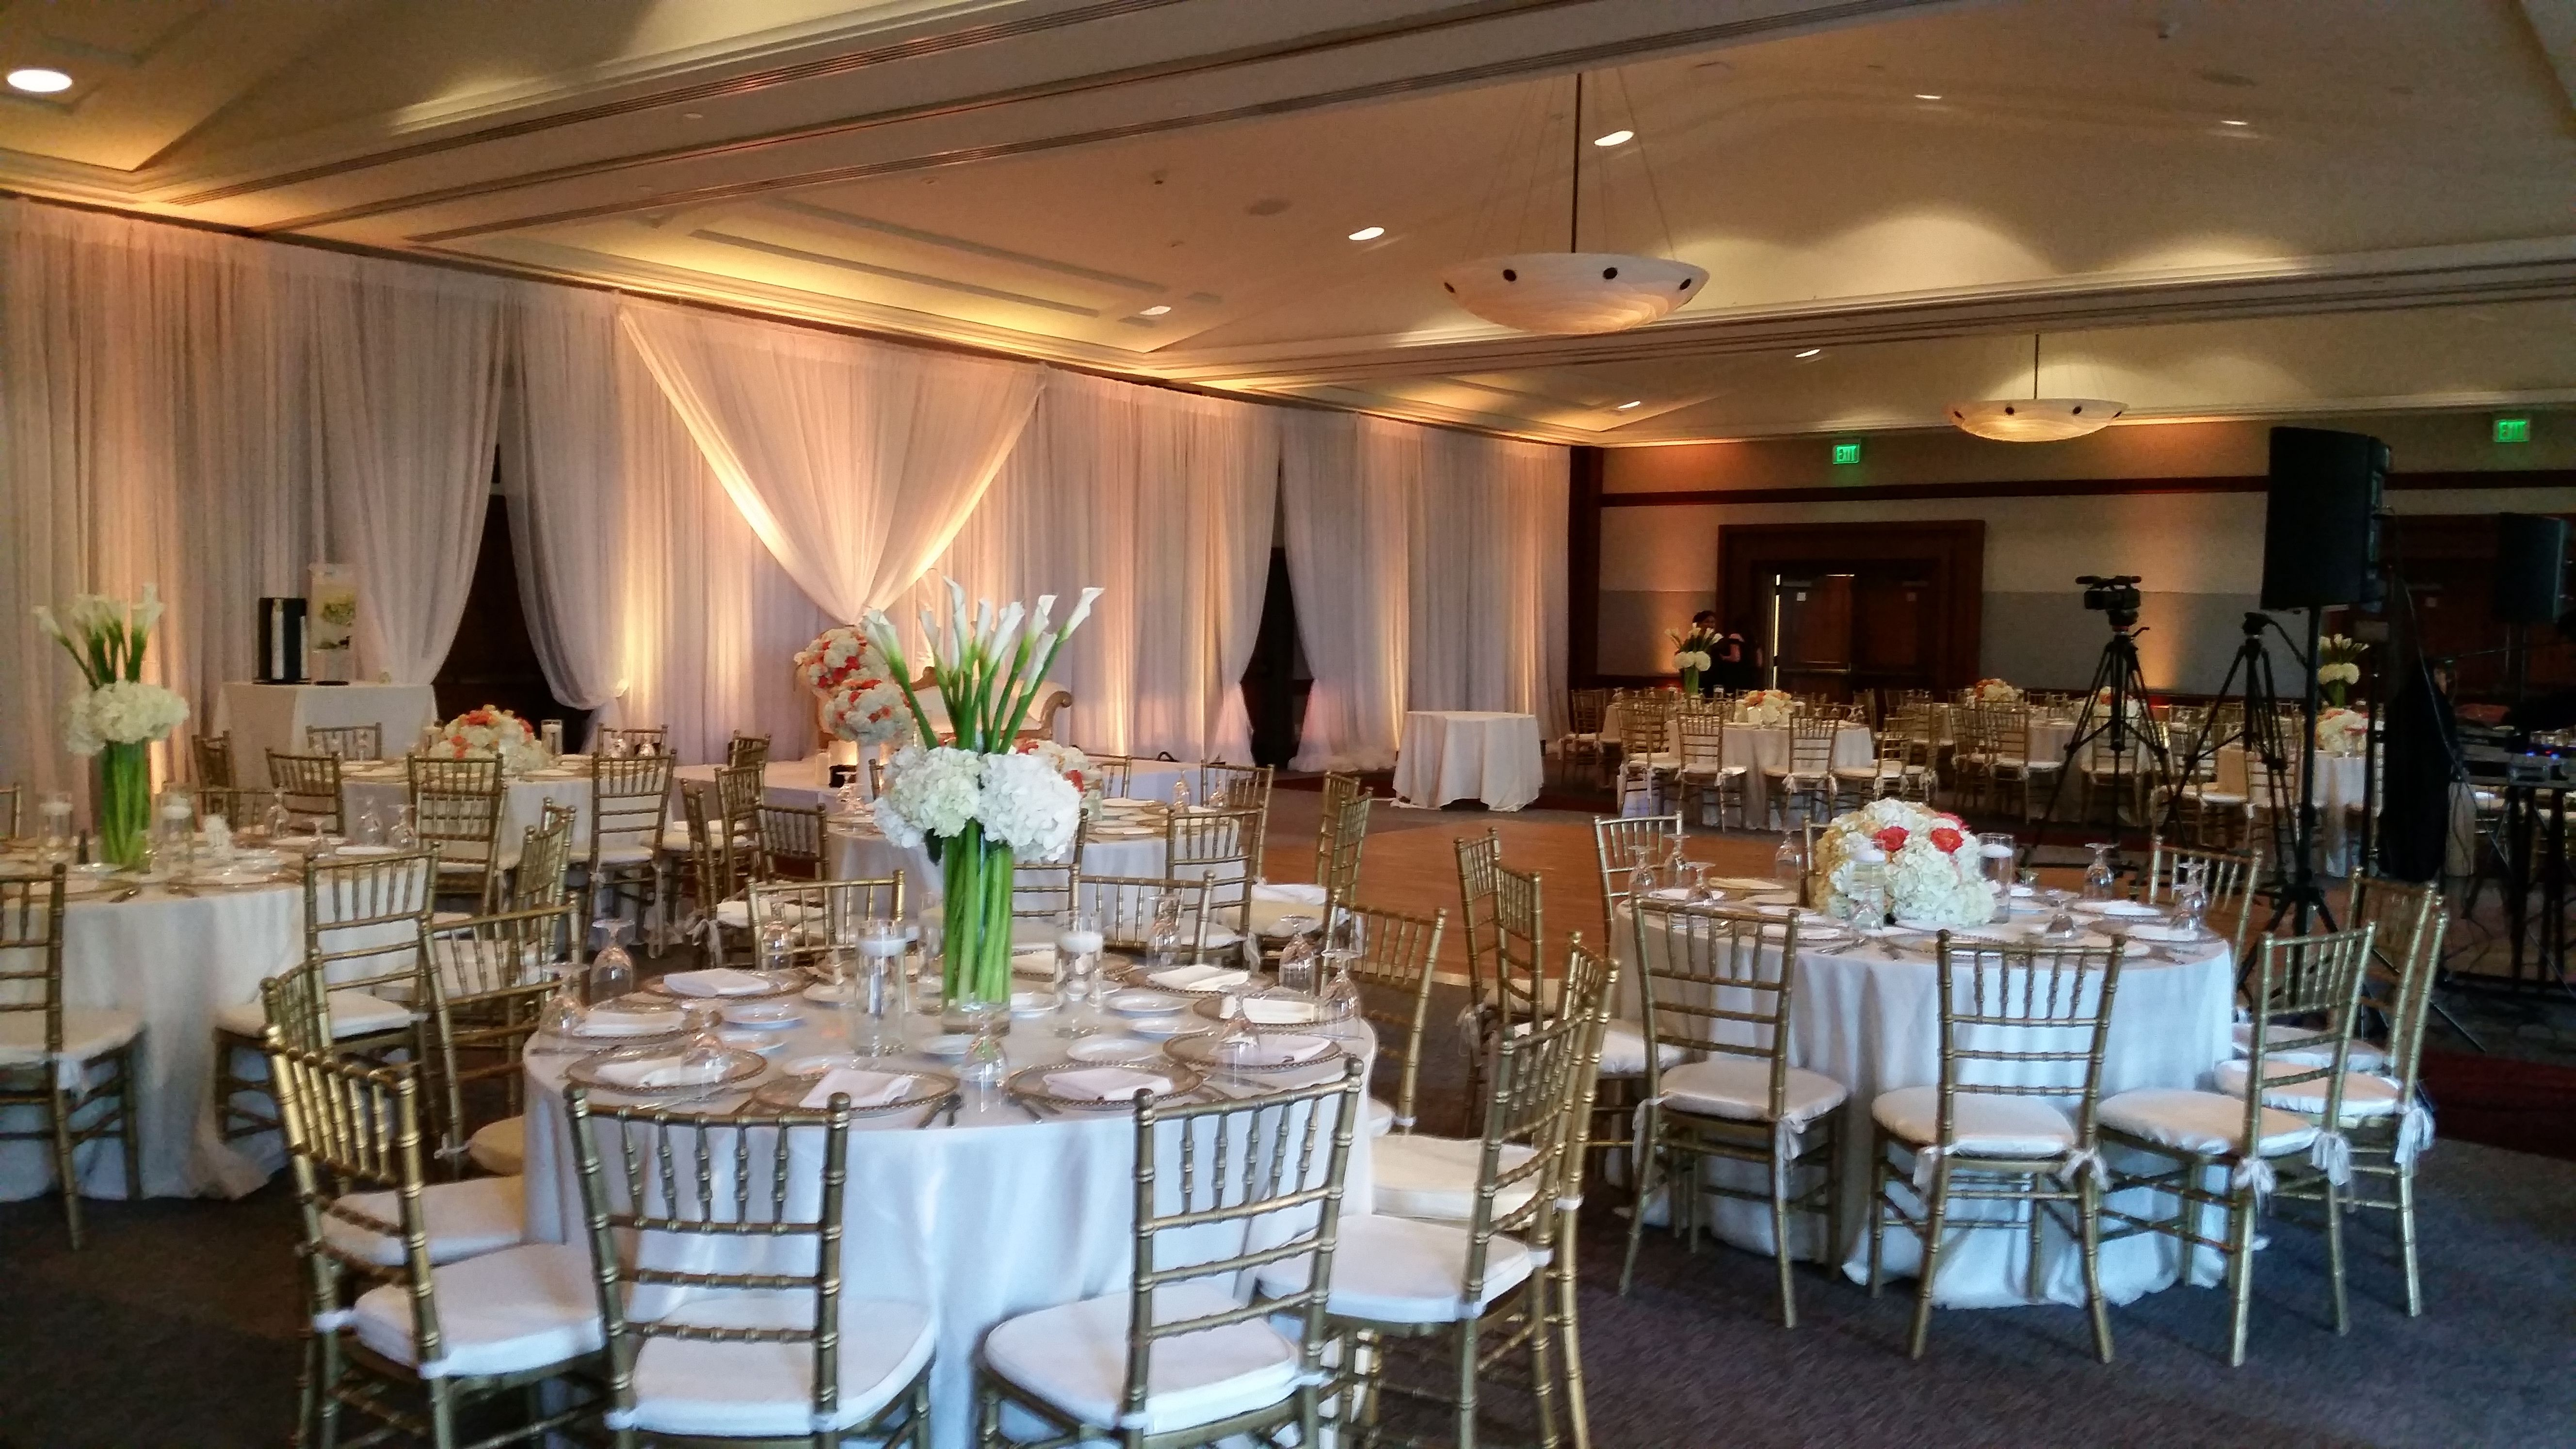 Mission Ballroom Wedding Reception Hyatt Weddingreception Missionbay Sandiego Socalwed Indoor Wedding Receptions Ballroom Wedding Reception Indoor Wedding